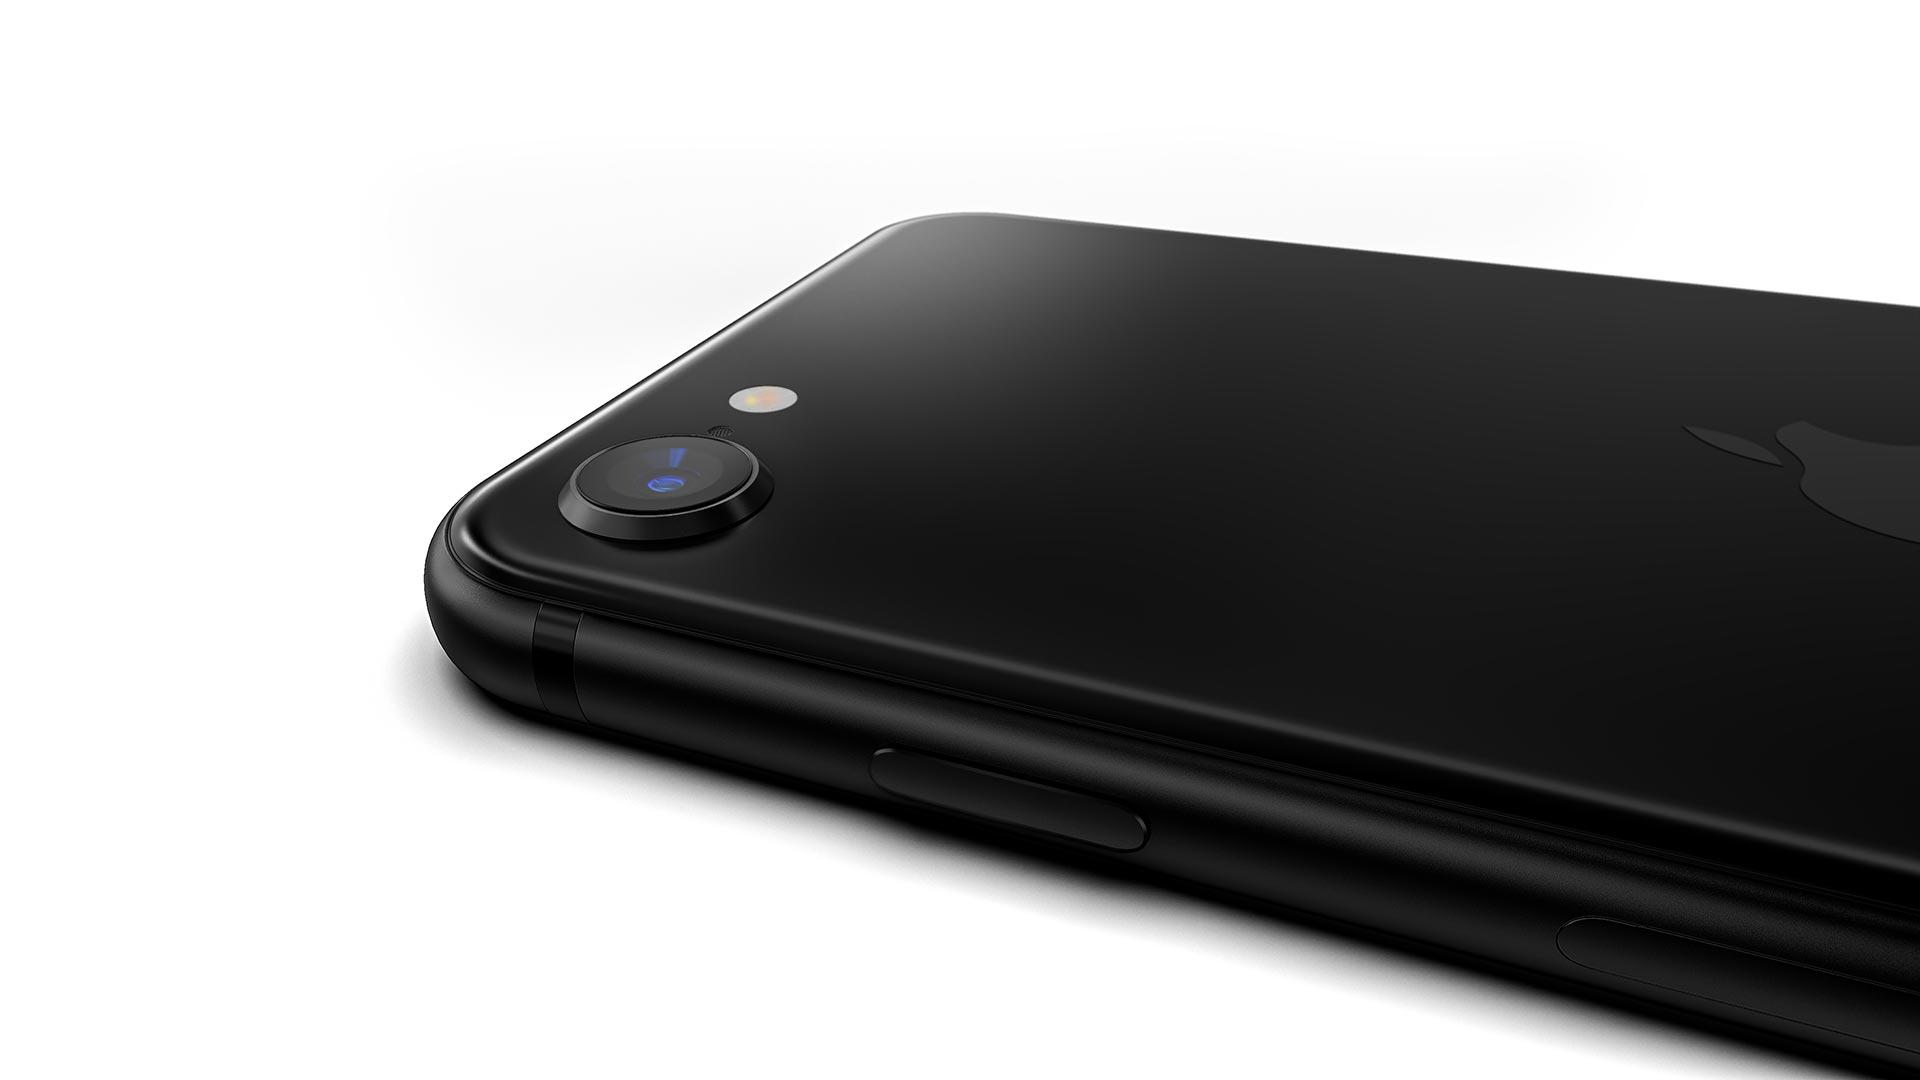 Apple Iphone SE Detailed Close Up Render